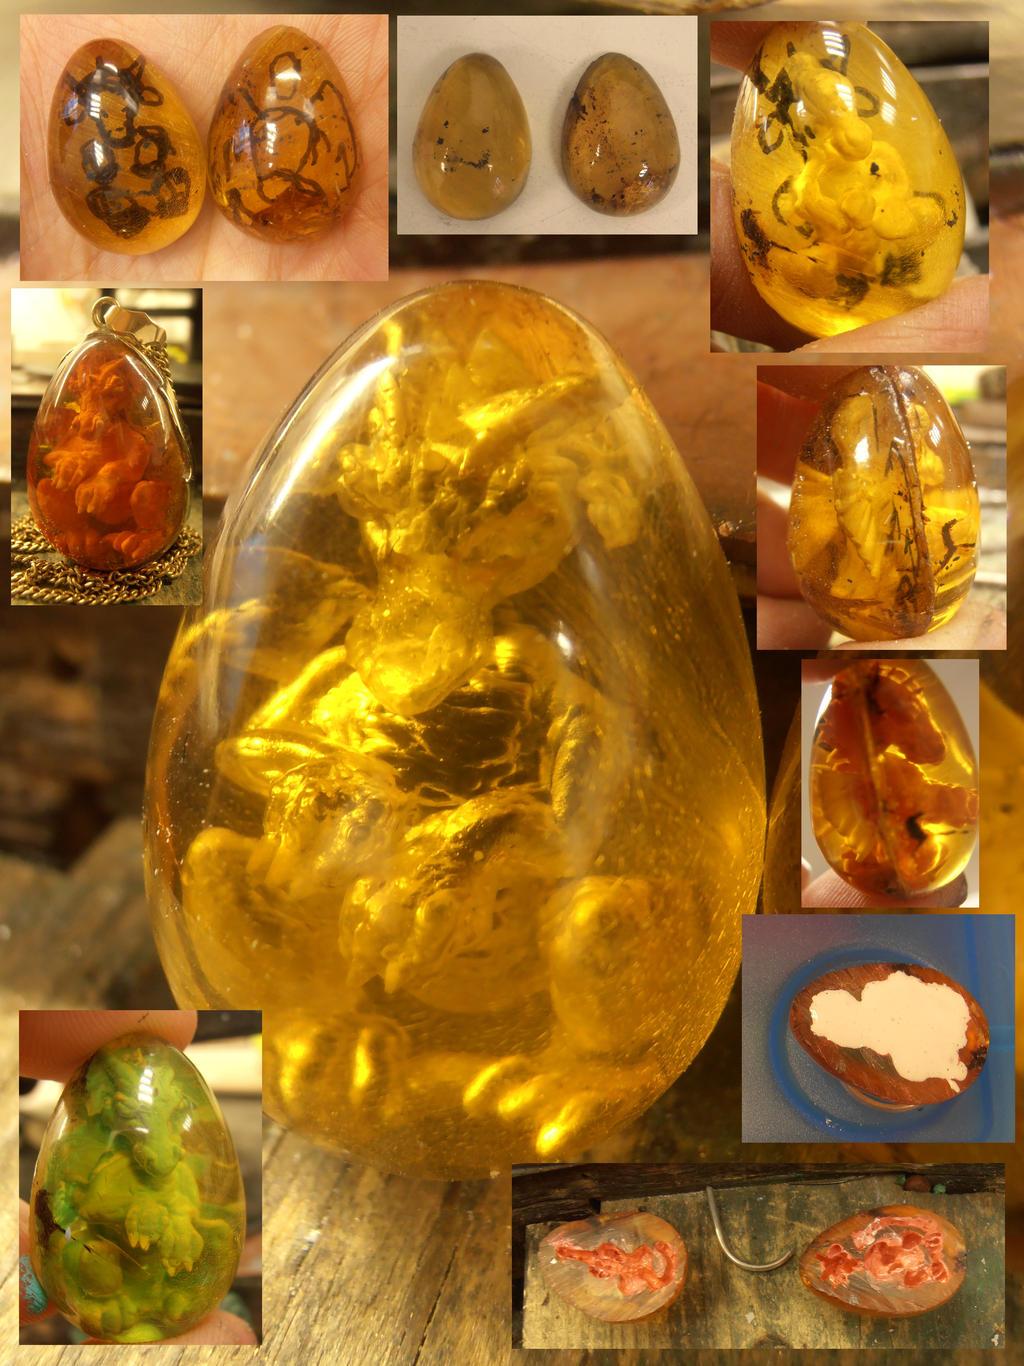 Leeroy the amber dragon in progress by WeirdWondrous